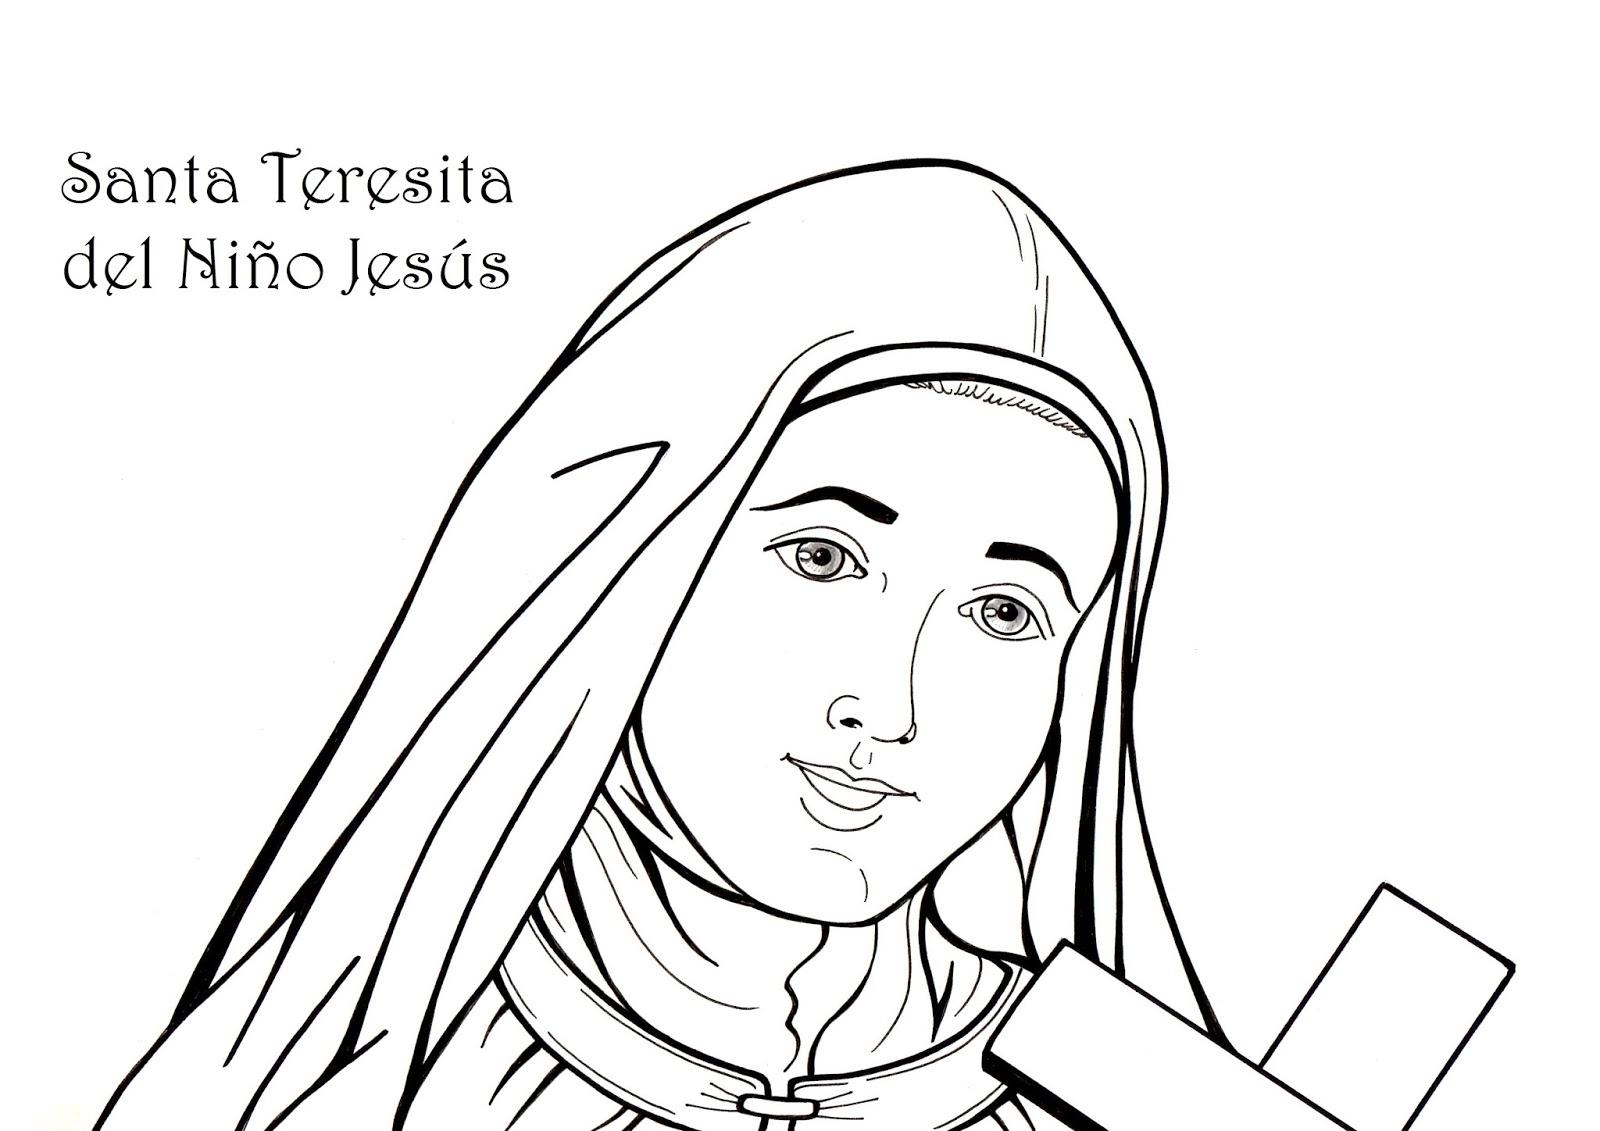 El Rincón de las Melli: LÁMINA: Santa Teresita del Niño Jesús